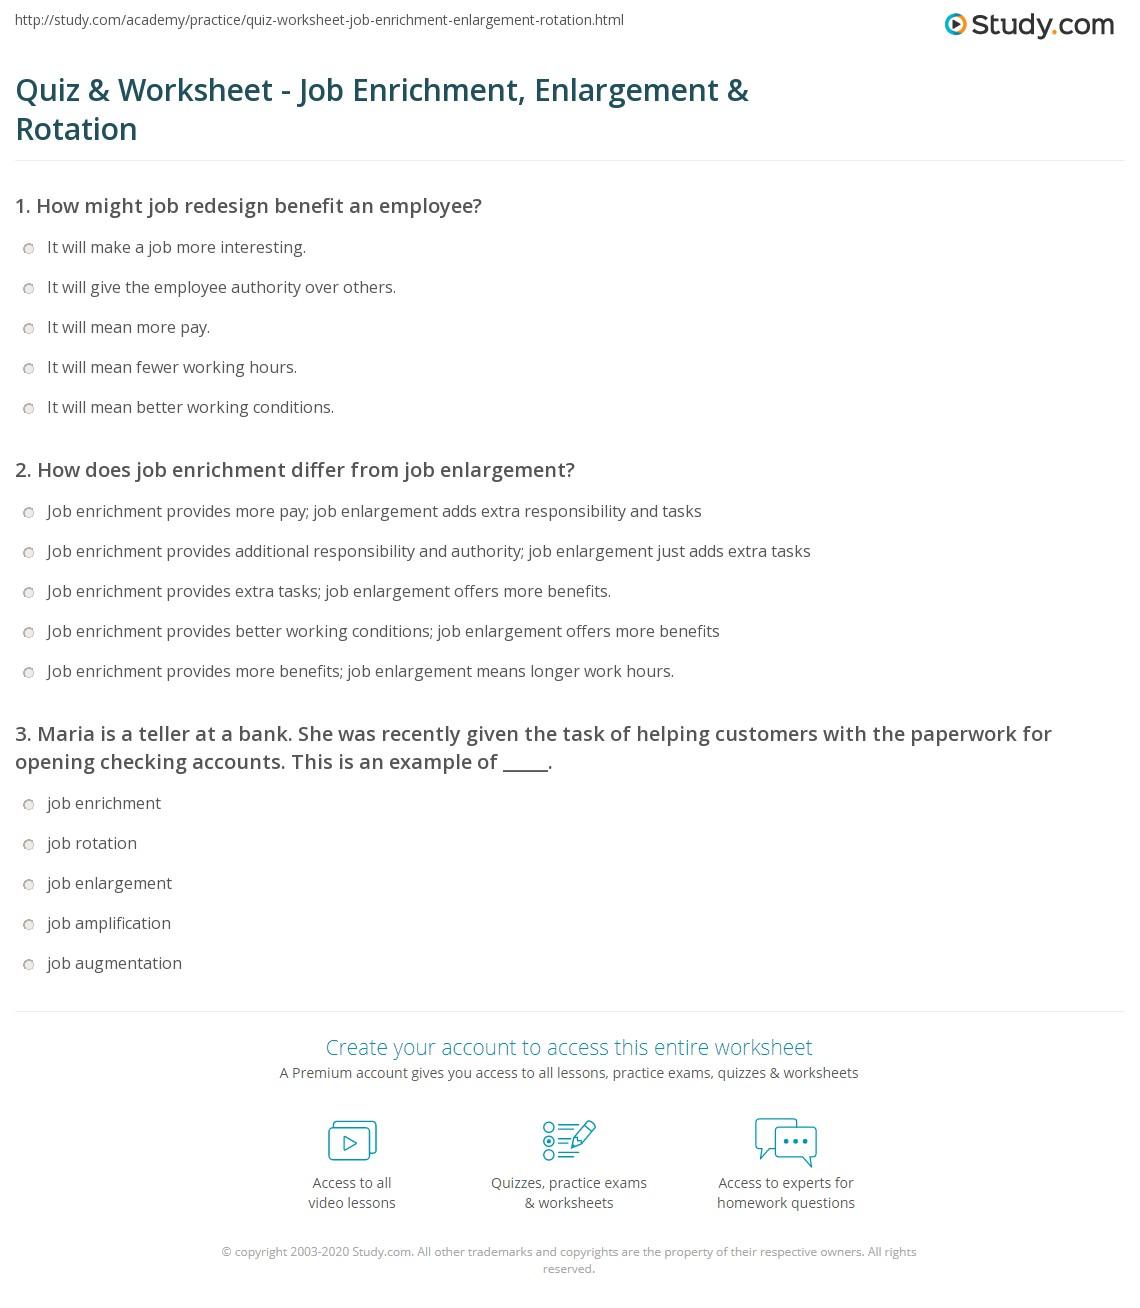 Quiz & Worksheet - Job Enrichment, Enlargement & Rotation | Study.com